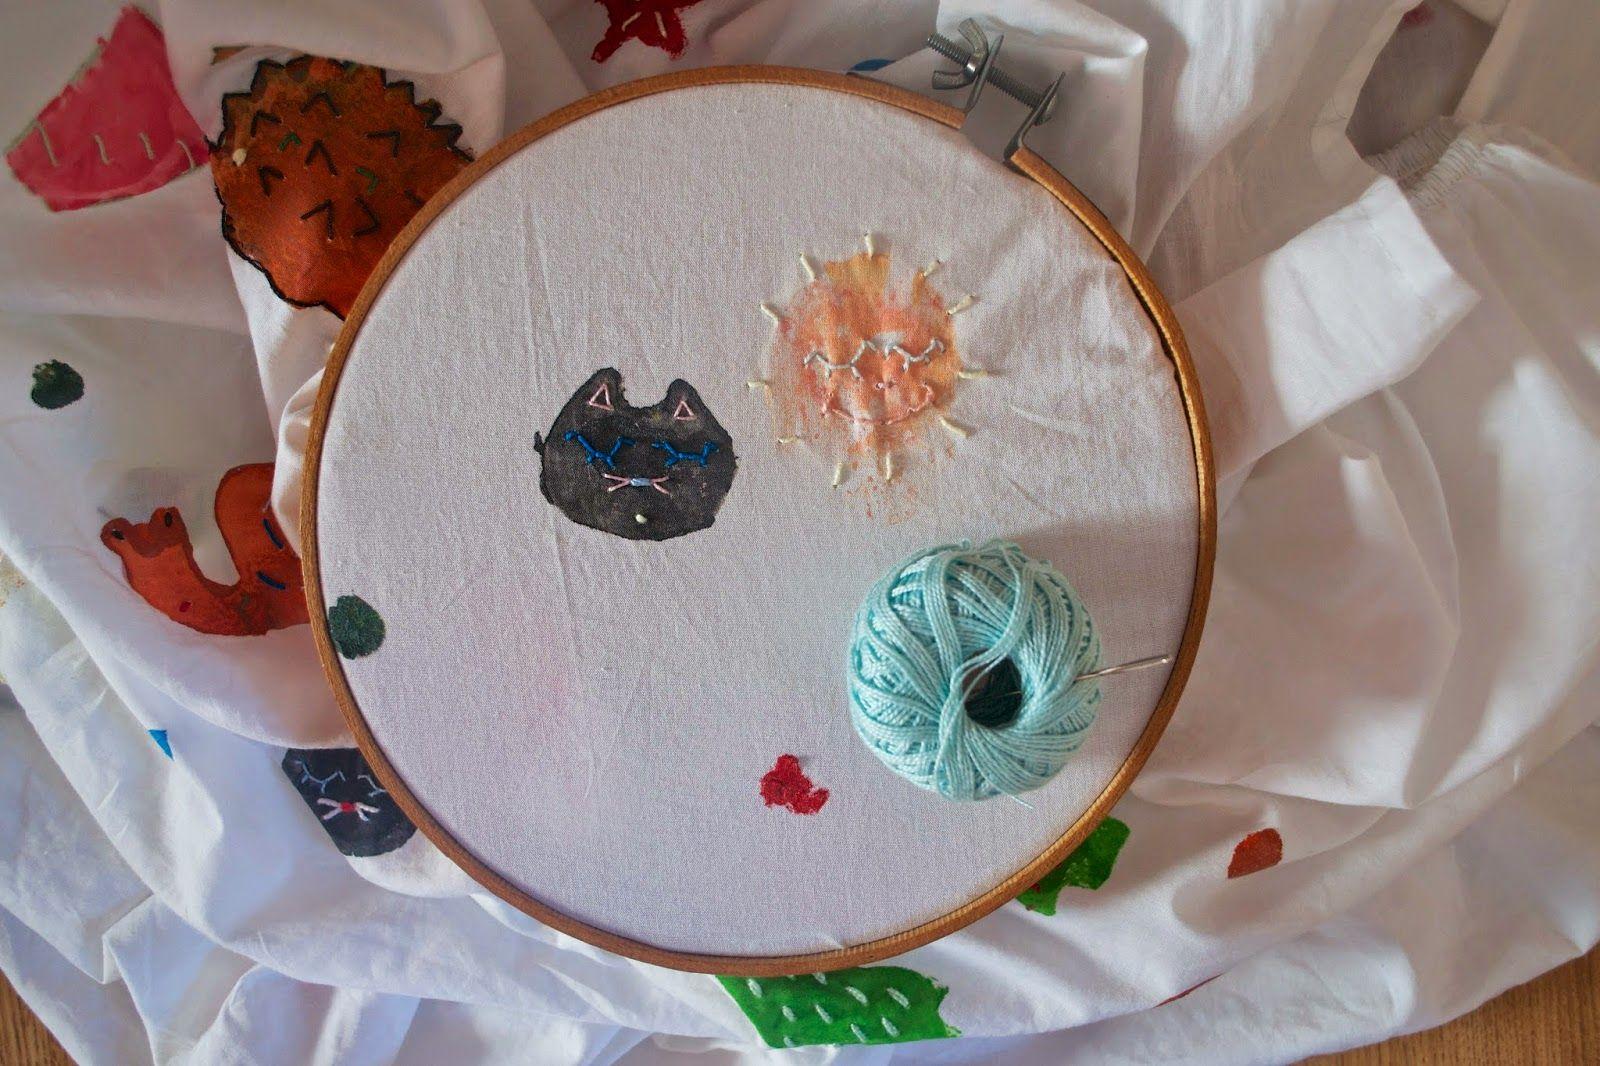 Pigs & Roses. Sabanita para el cole. Sheet. Sábana. DIY. Tutorial. Potato Stamp. Sello patata. Fabric paint. Pintura de tela. Embroidery. Bordado.